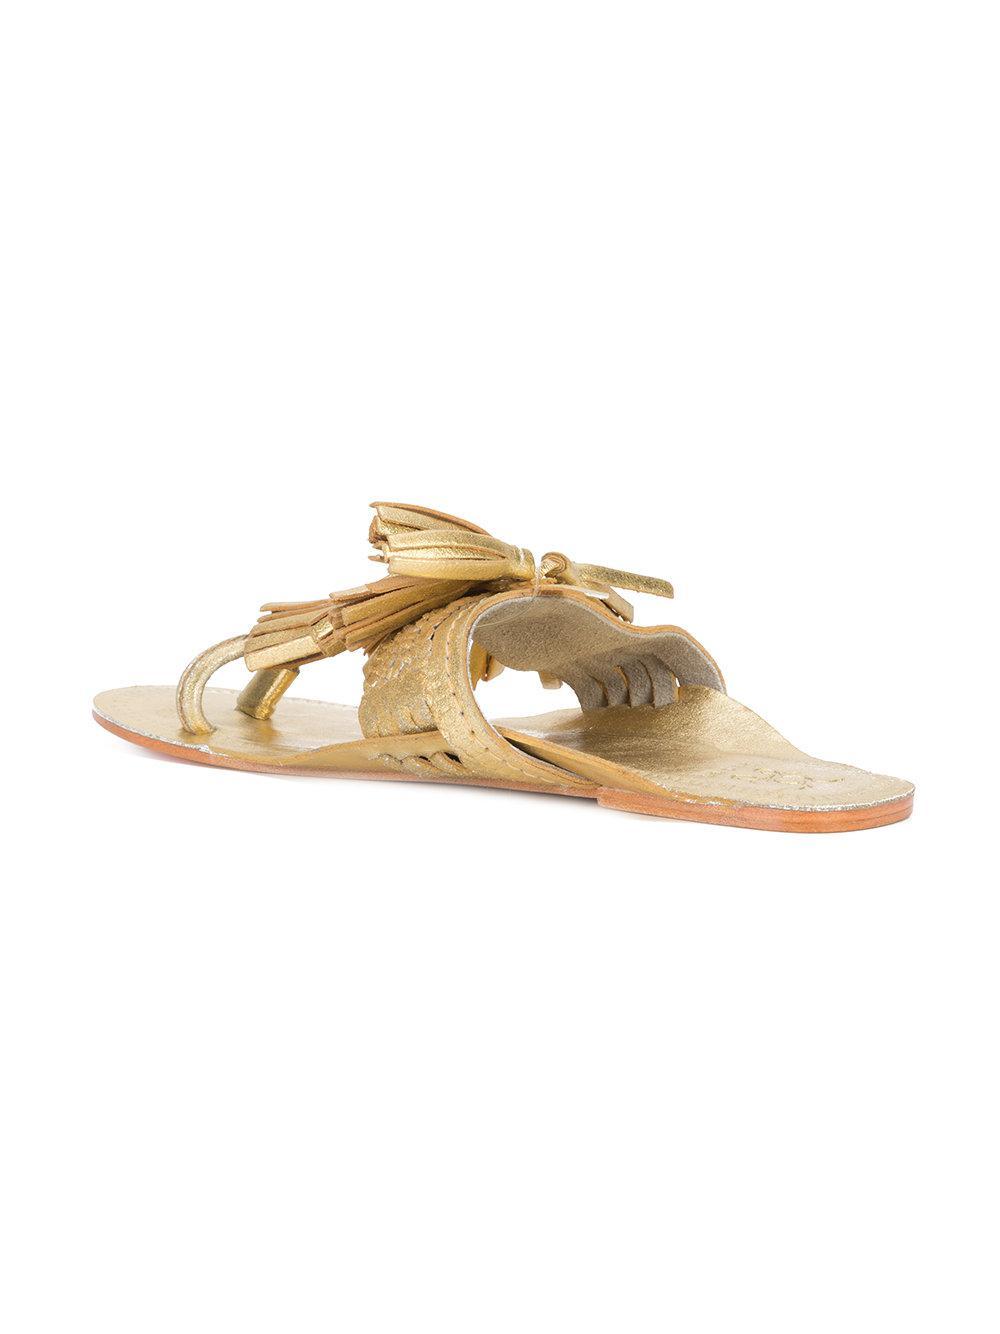 Figue tassel flat sandals - Metallic farfetch beige 7WzERgi